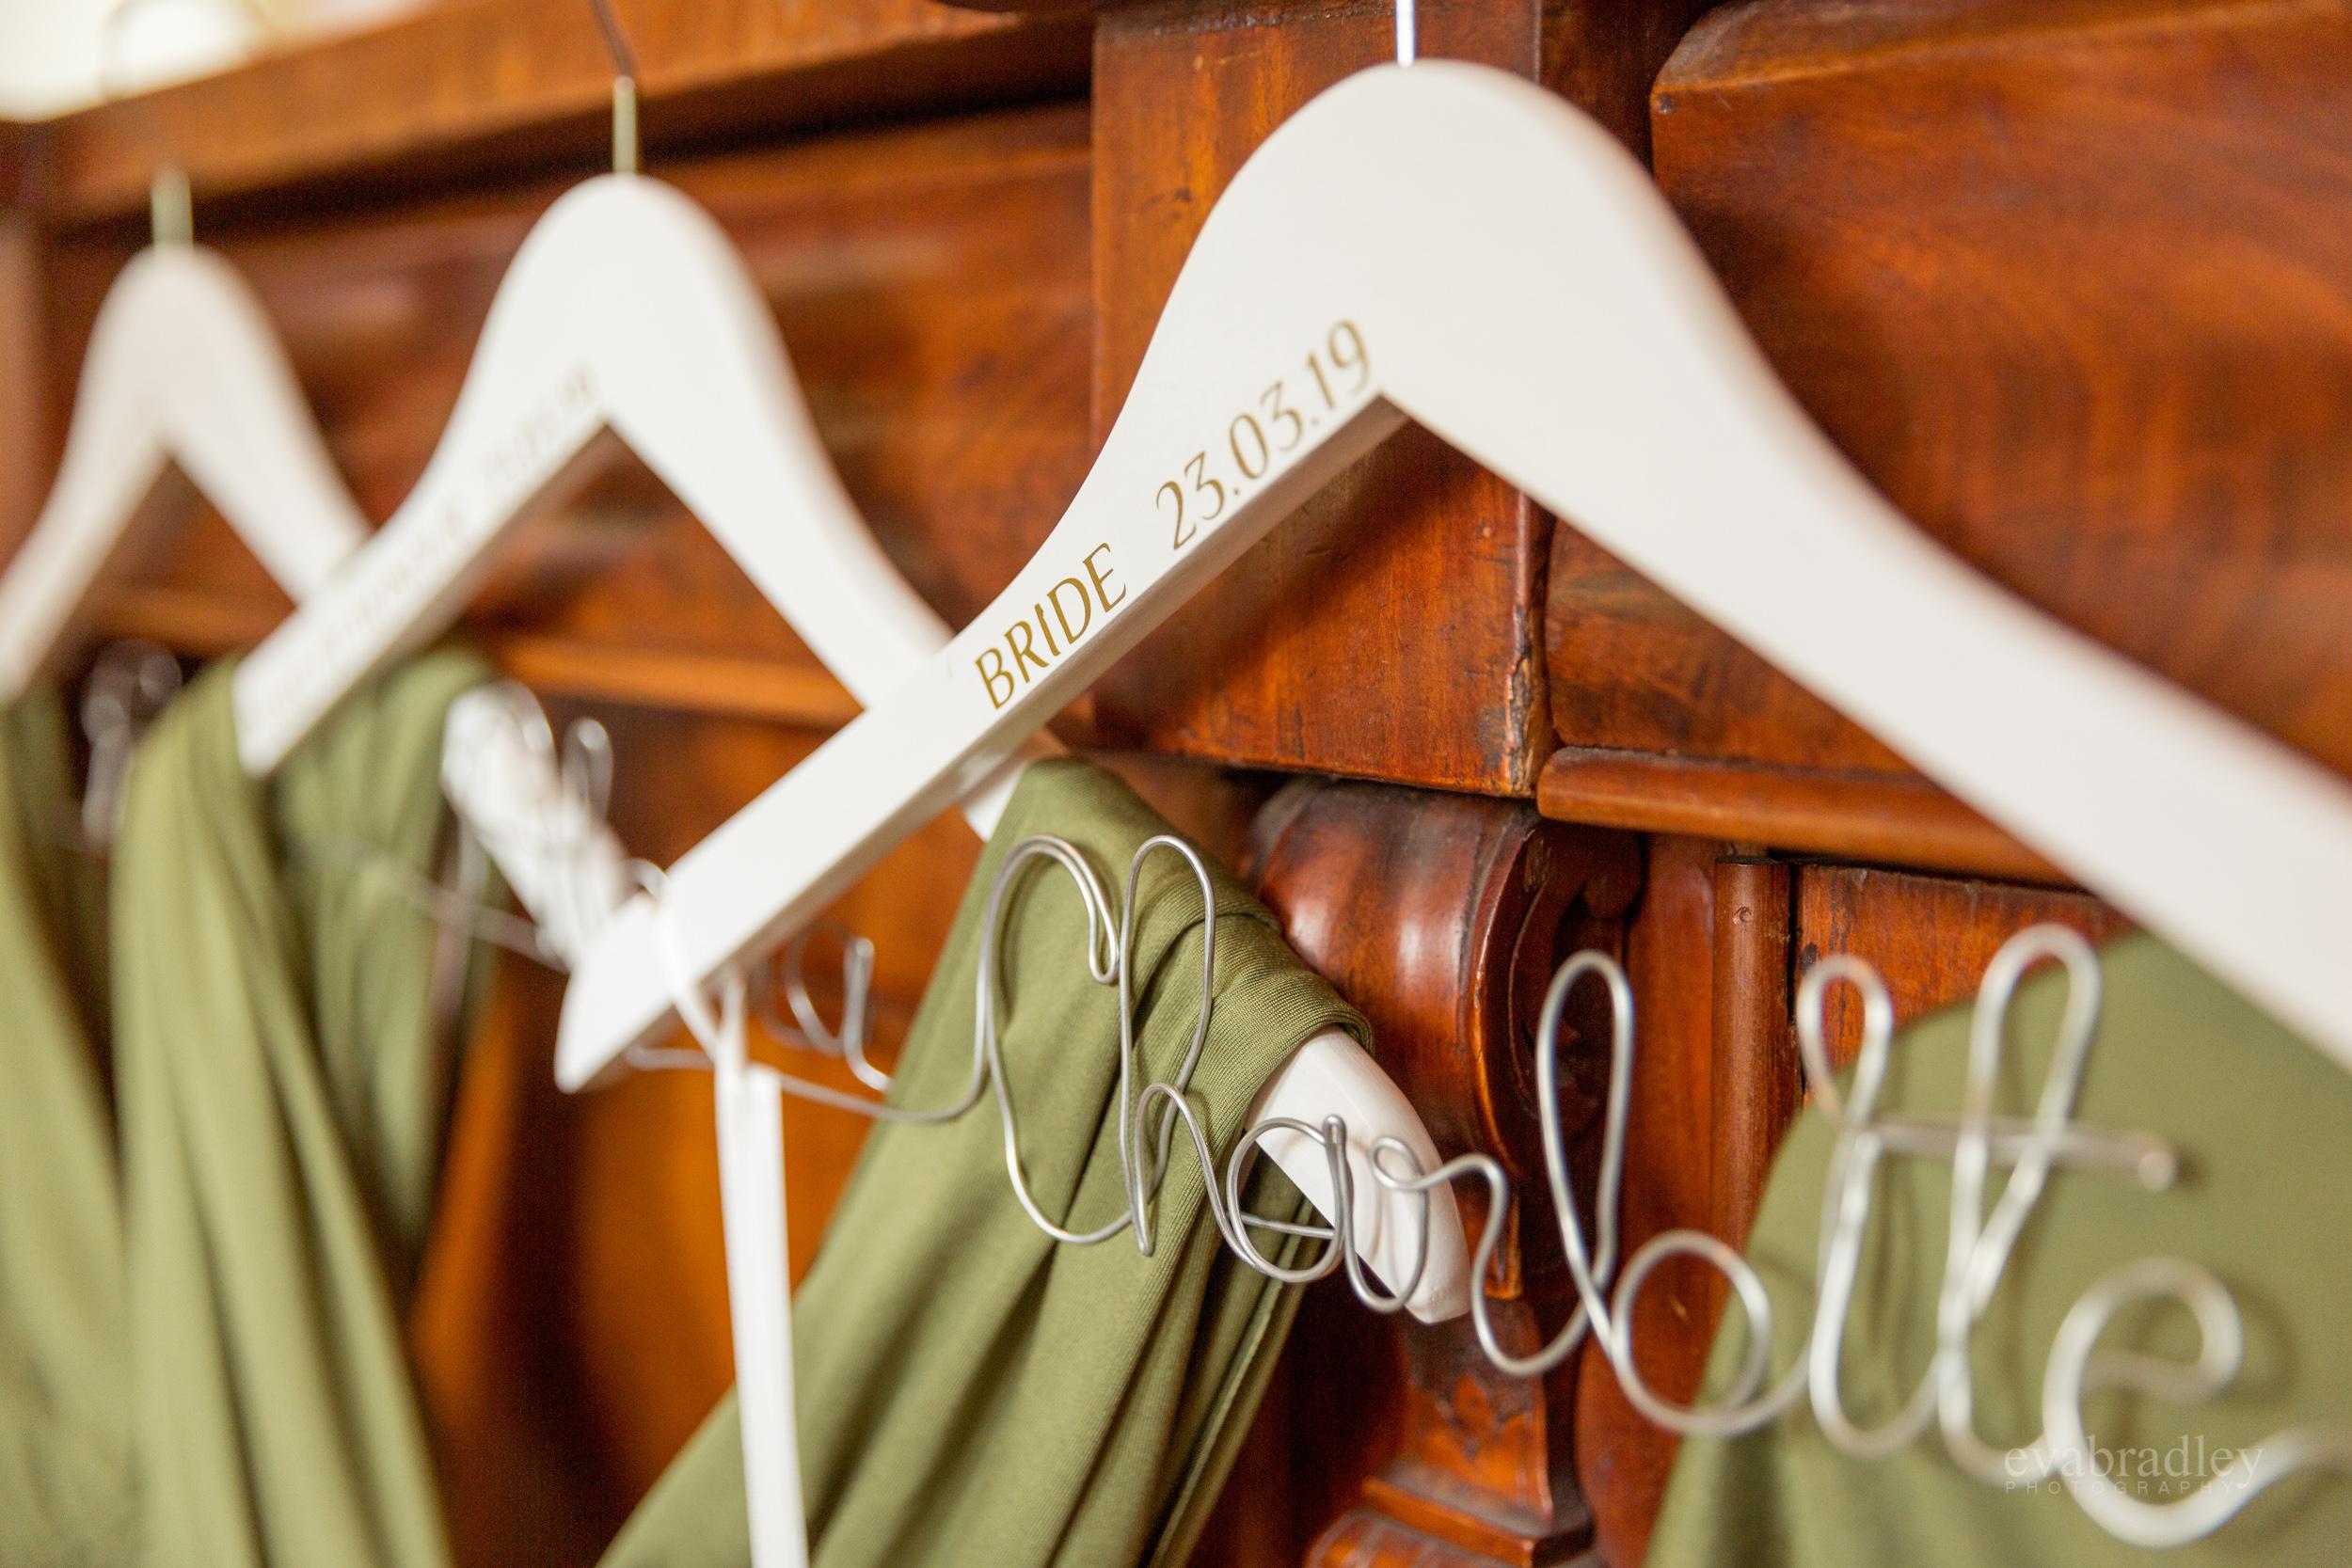 personalised-coat-hangers-nz